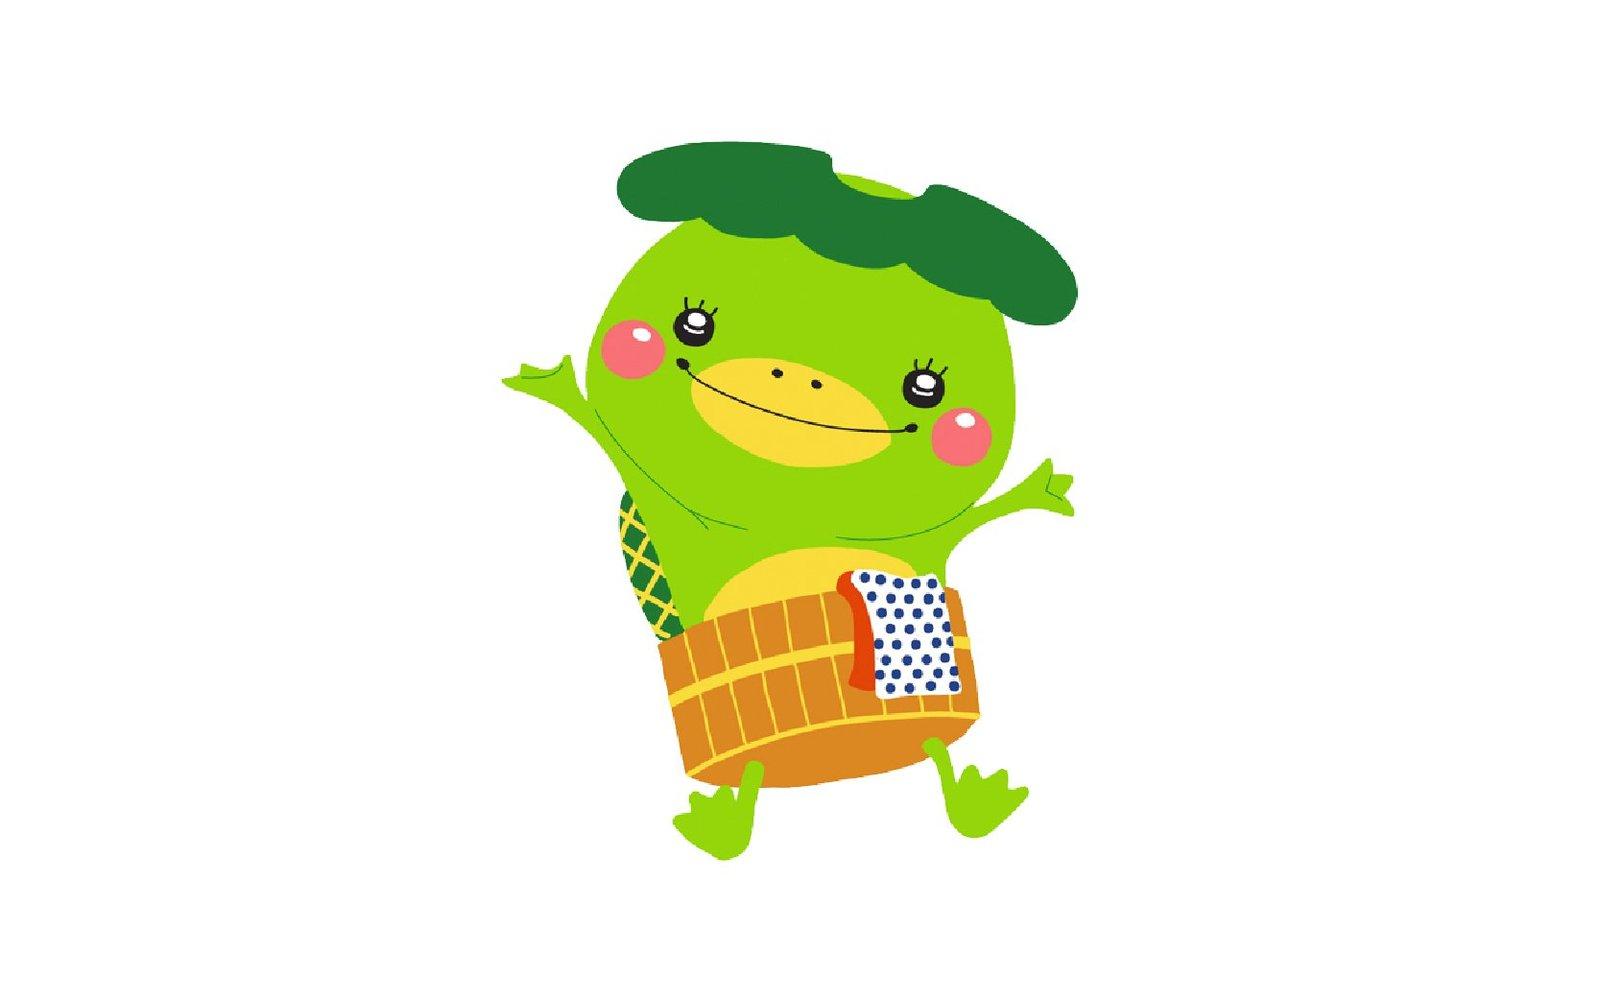 kappon is the onsen frog mascot of jozankei onsen in hokkaido japan